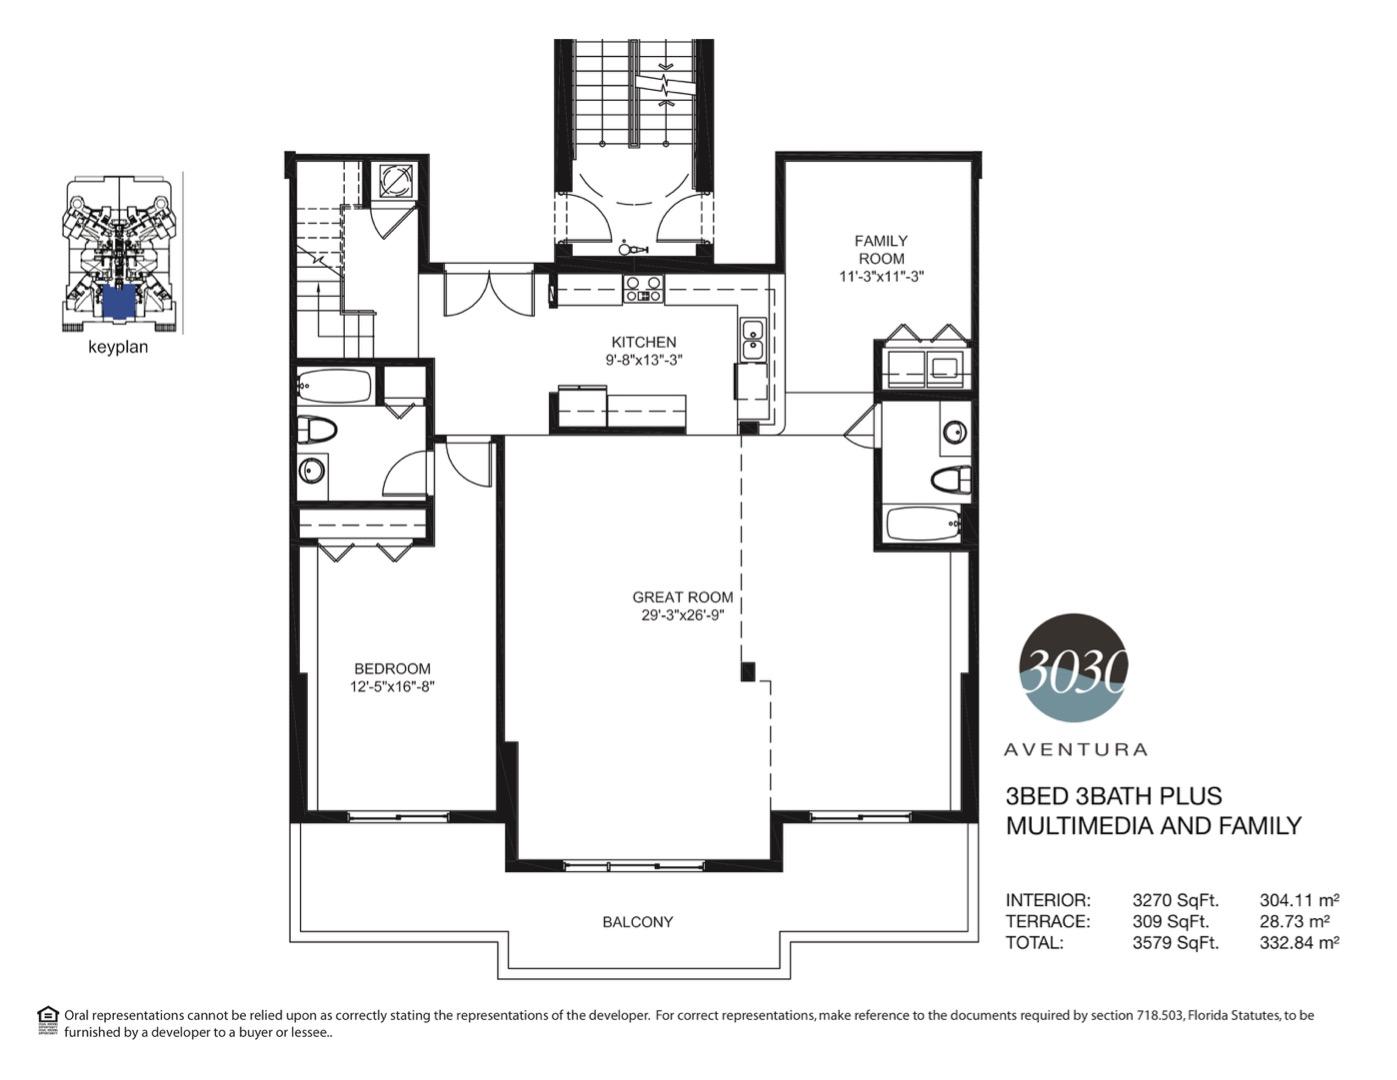 Floor plan image 10 - 3 + Media + Fam / 3  - 3579 sqft image